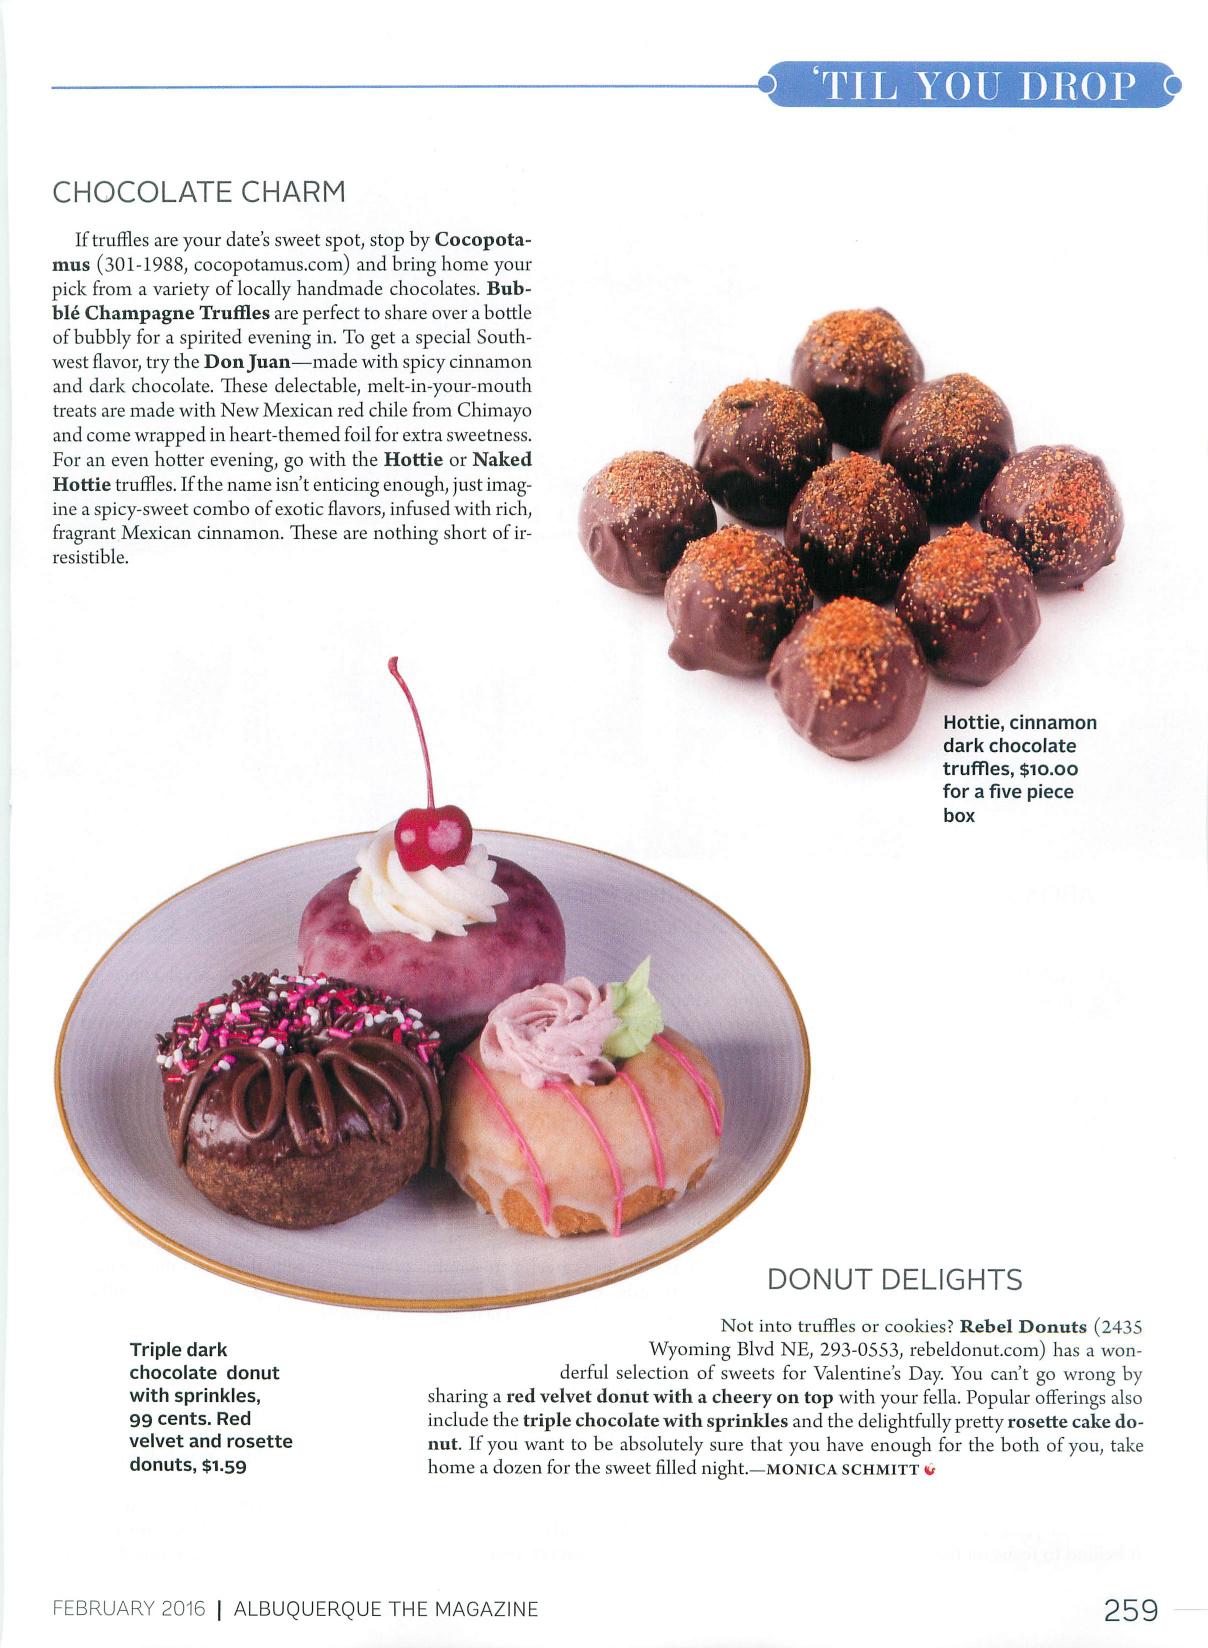 Cocopotamus Chocolate Press Coverage and Reviews